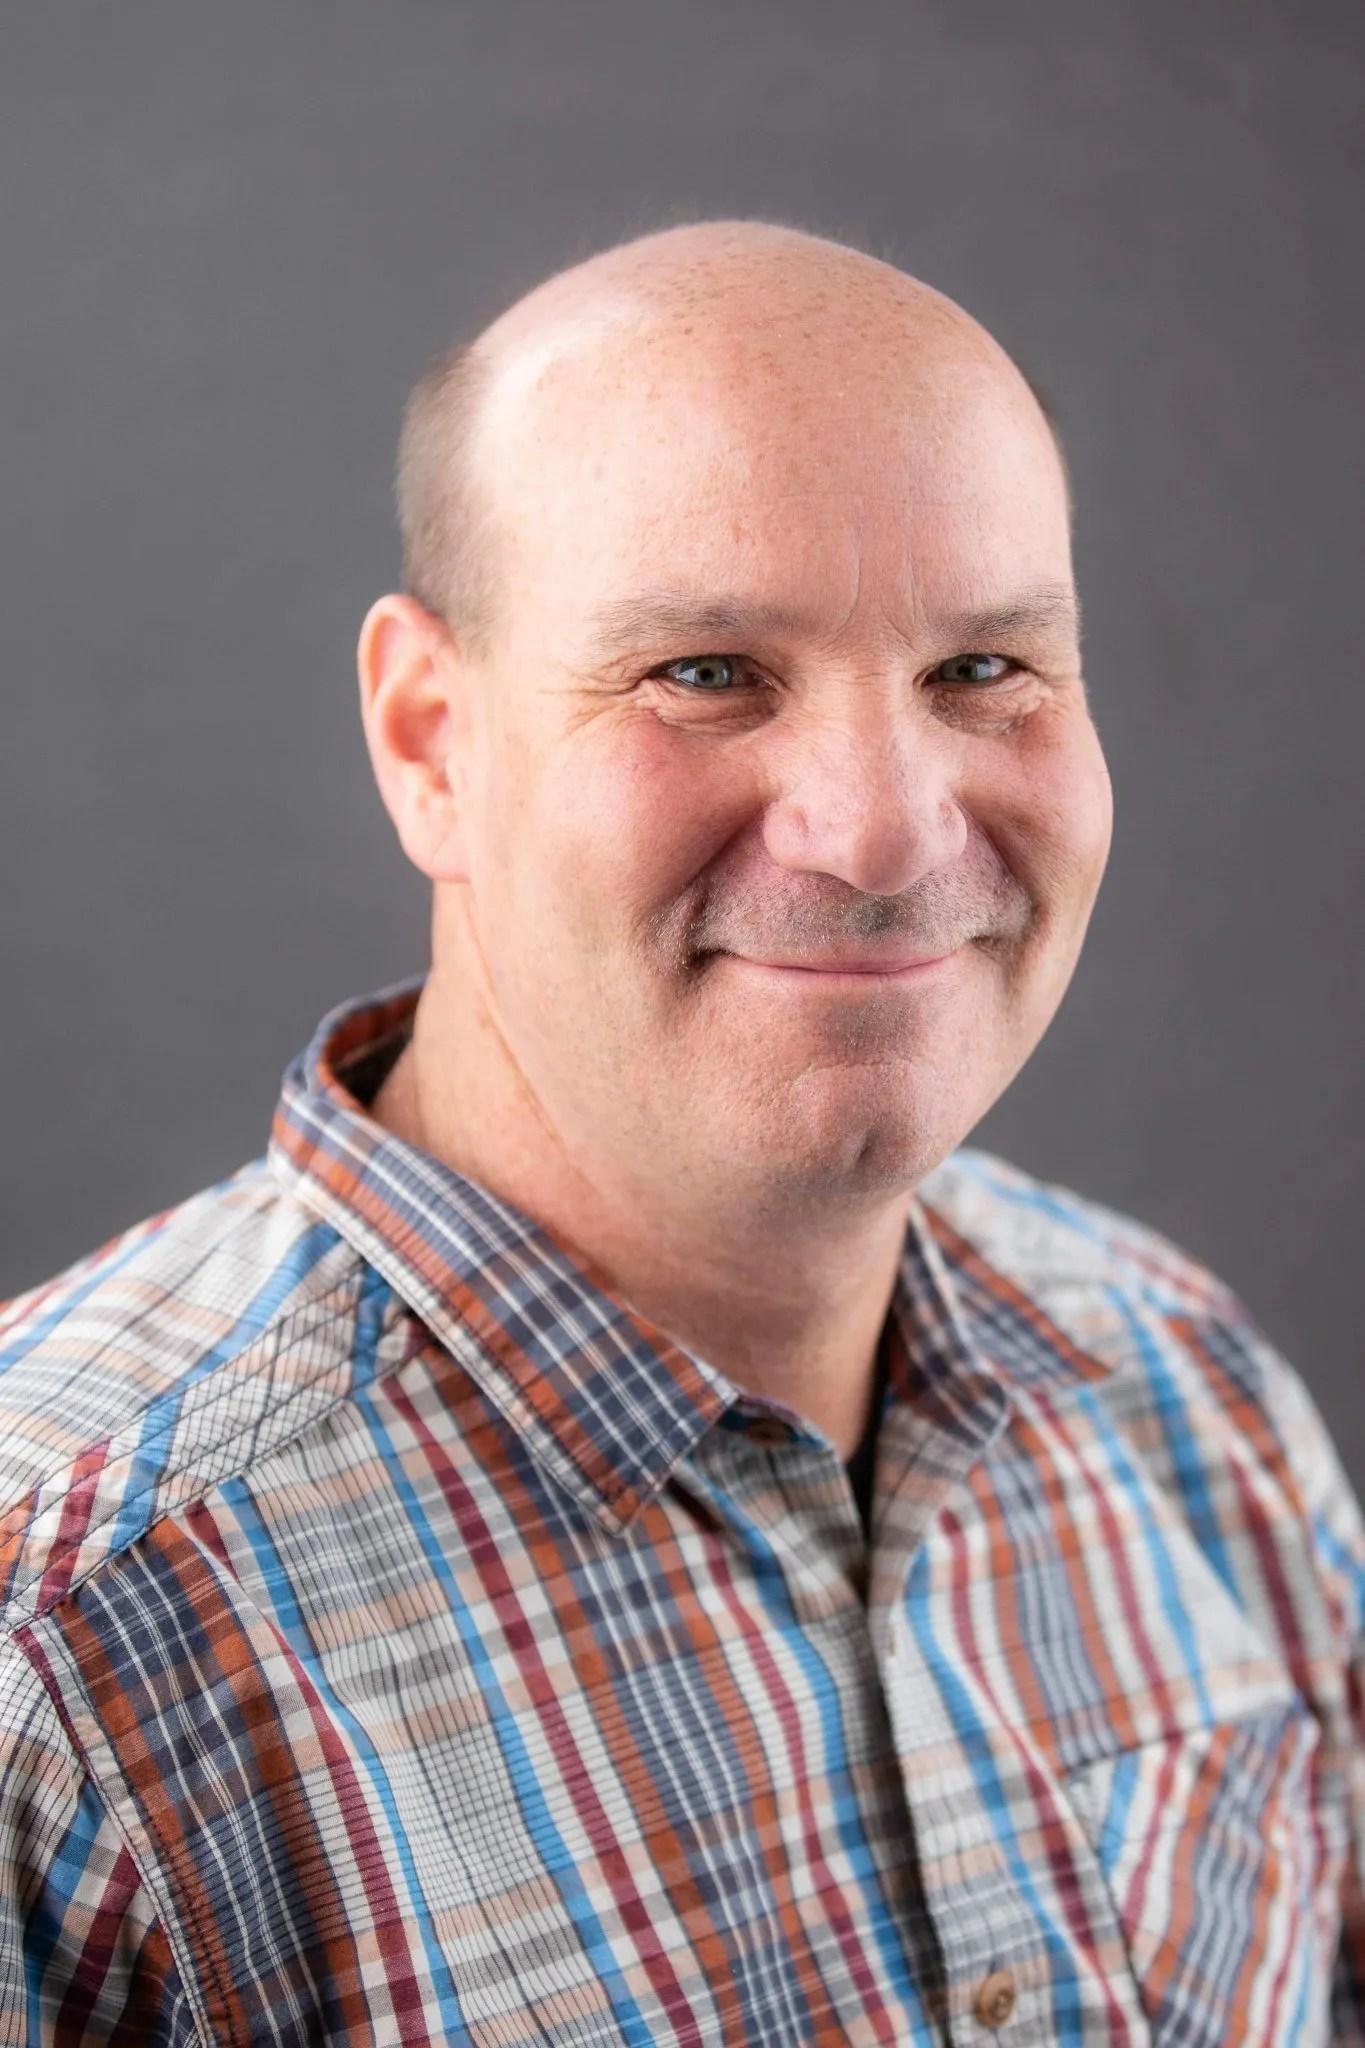 Joey Killian, Physical Therapist at JCHC